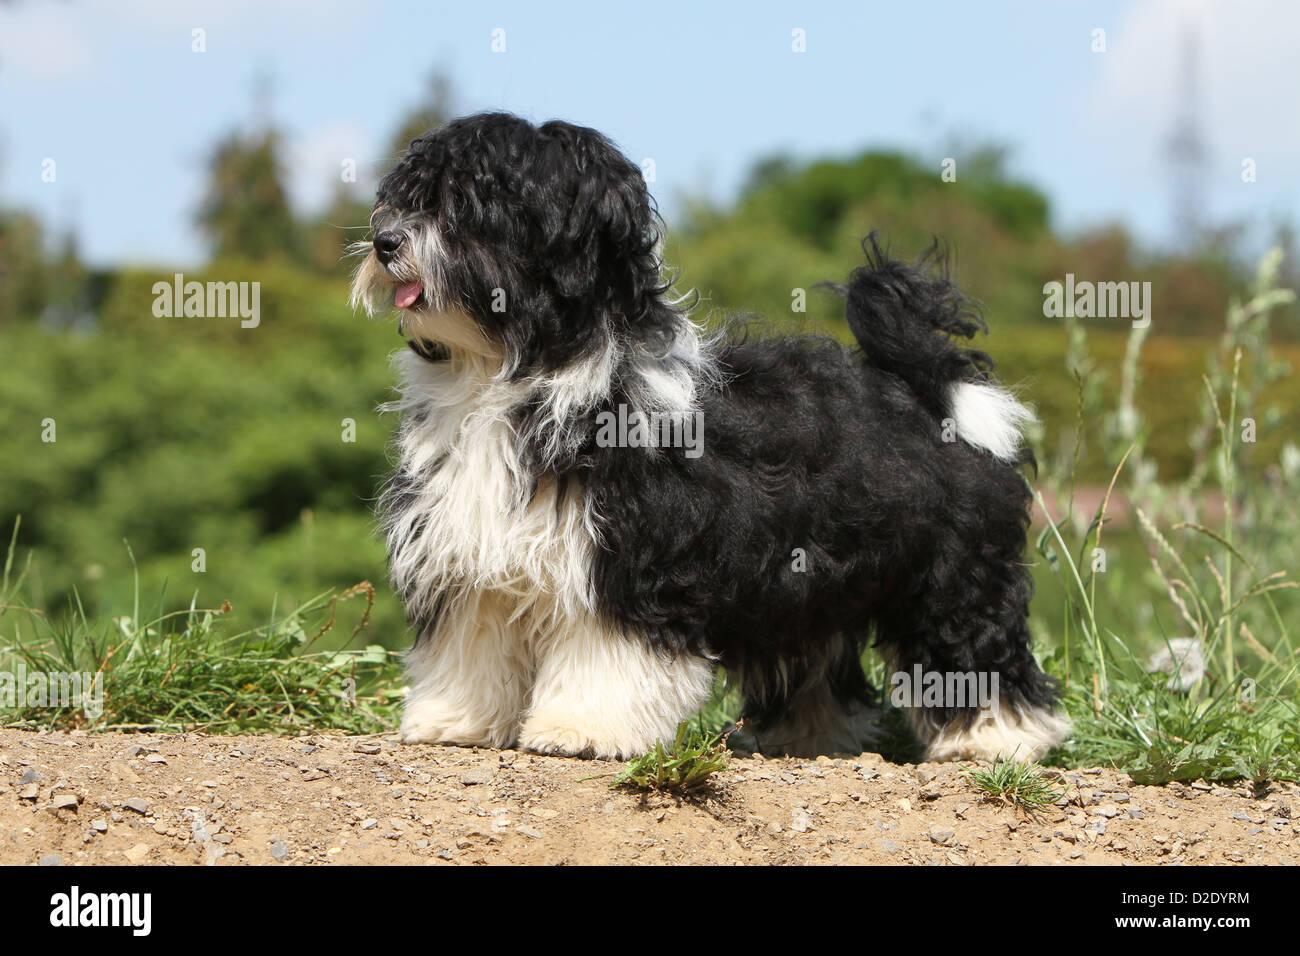 Dog Havanese Bichon Havanais Havaneser Puppy Black And White Stock Photo Alamy